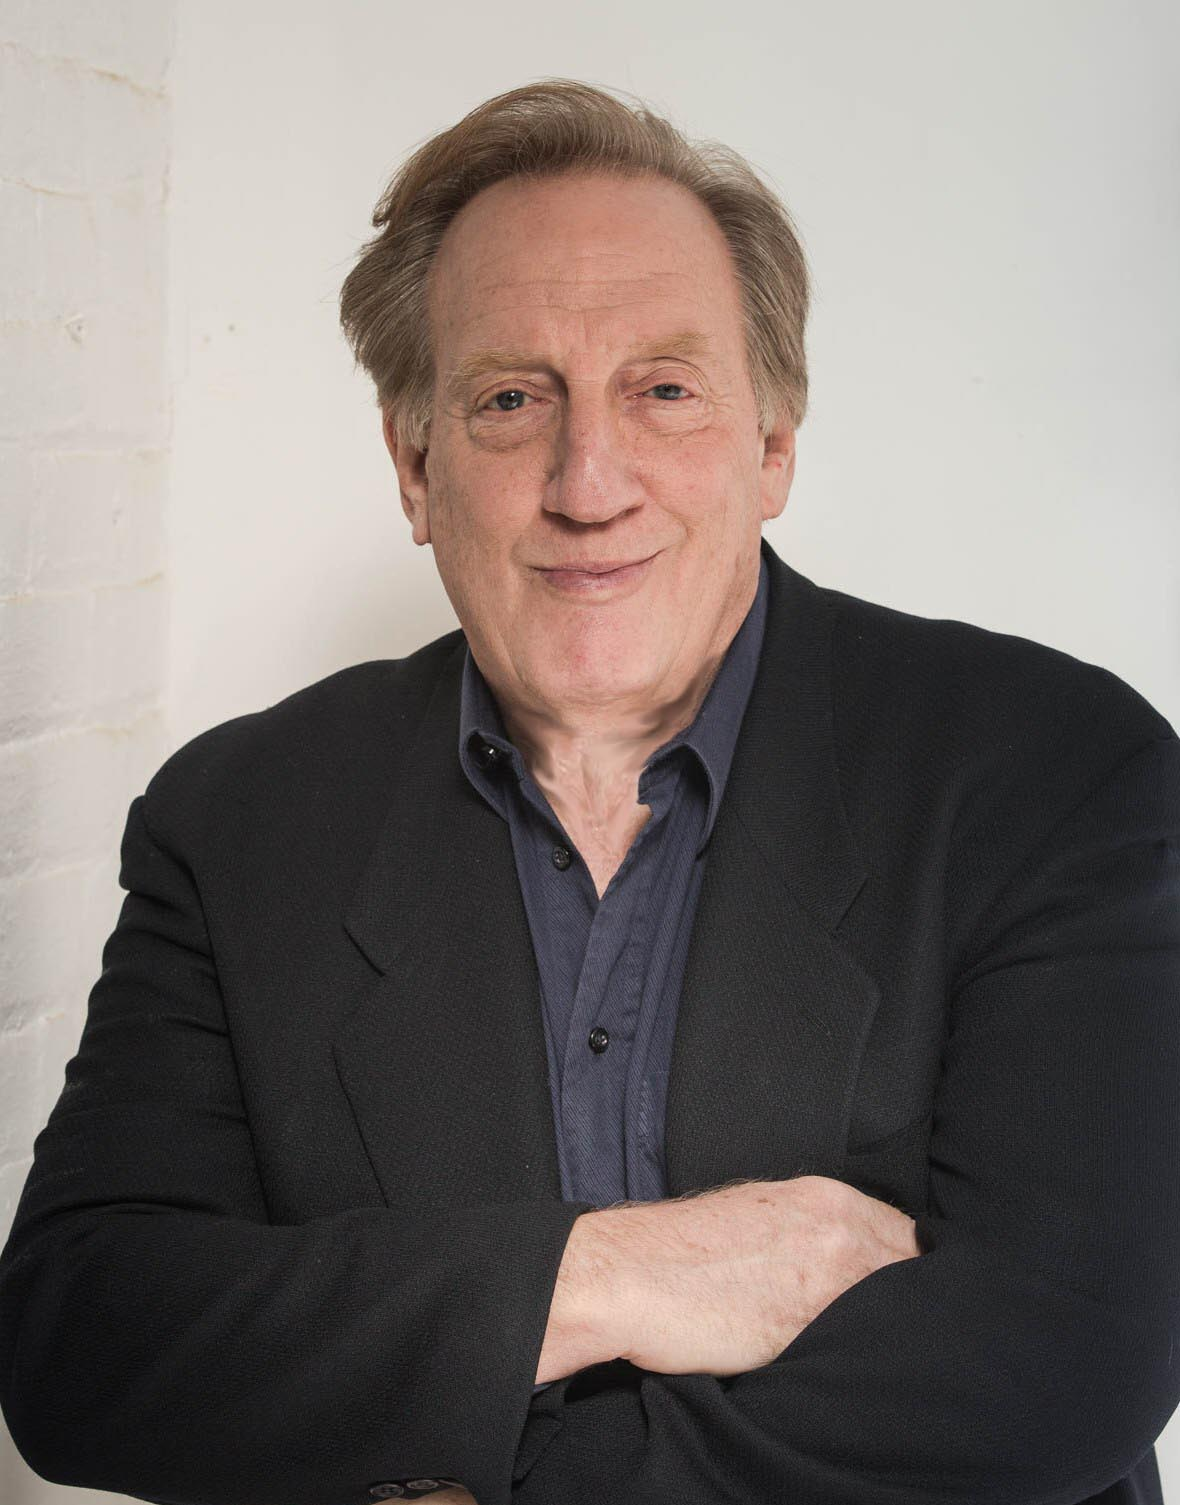 Alan Zweibel Wikipedia